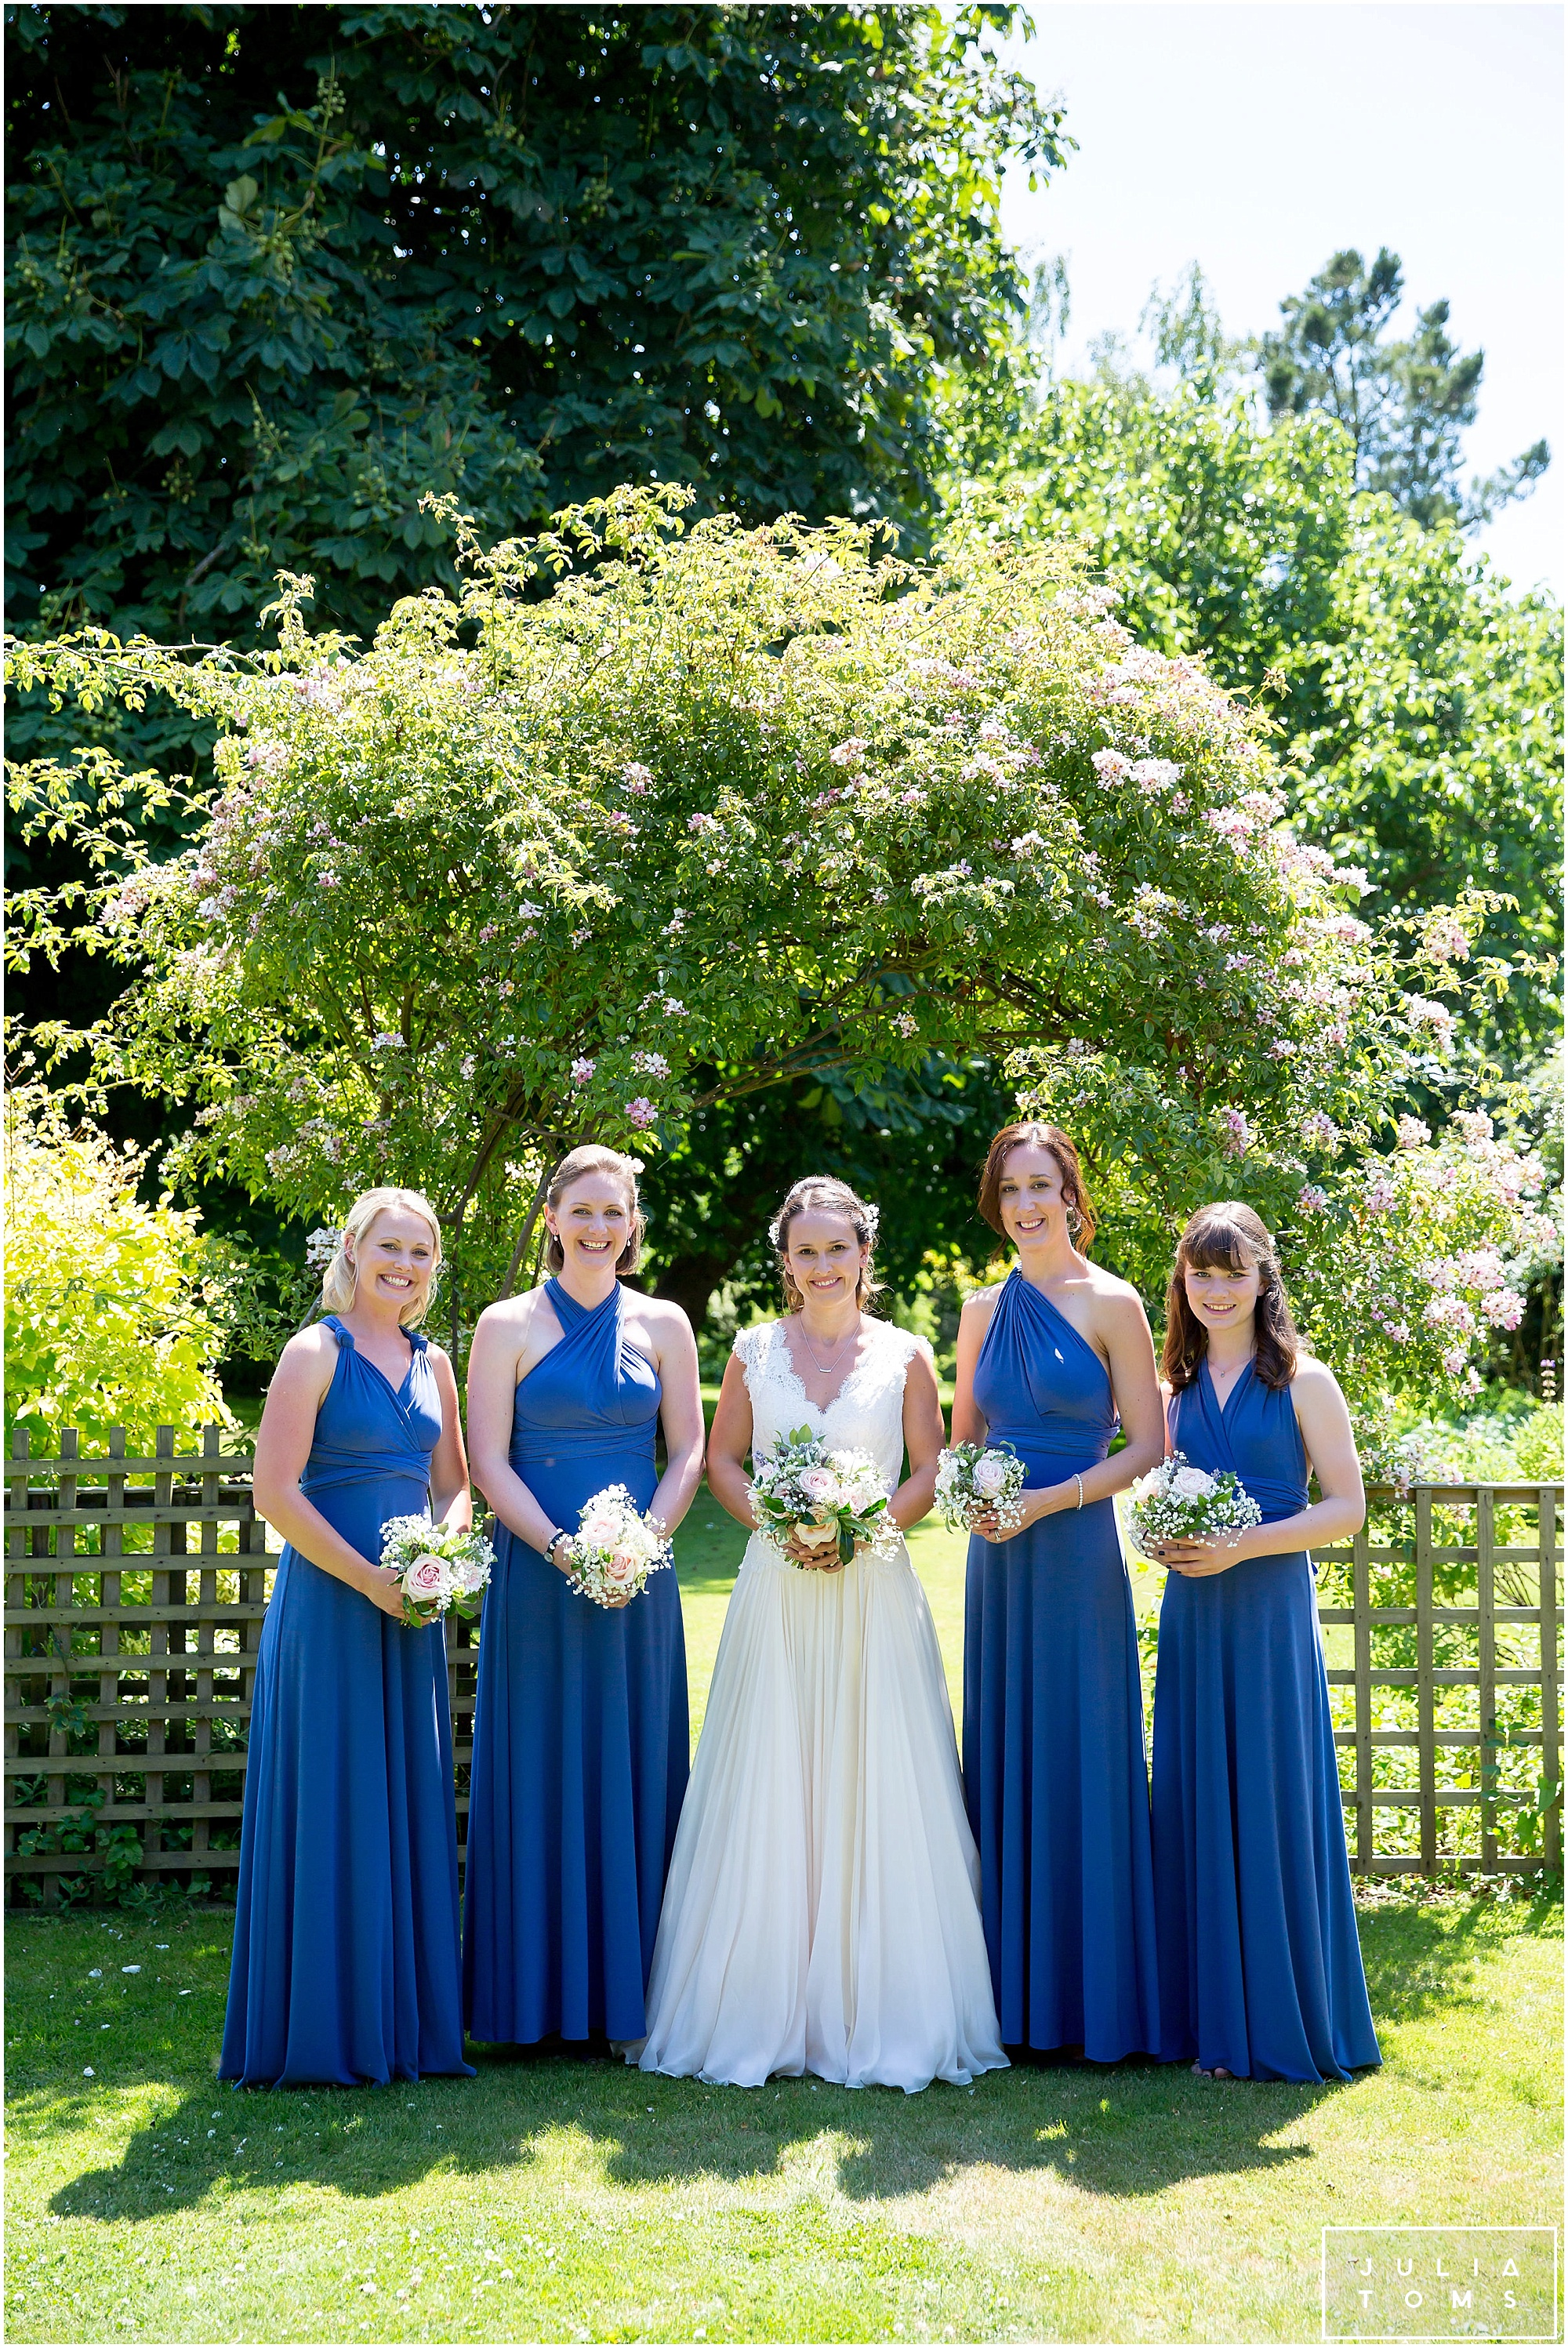 julia_toms_chichester_wedding_photographer_portsmouth_014.jpg